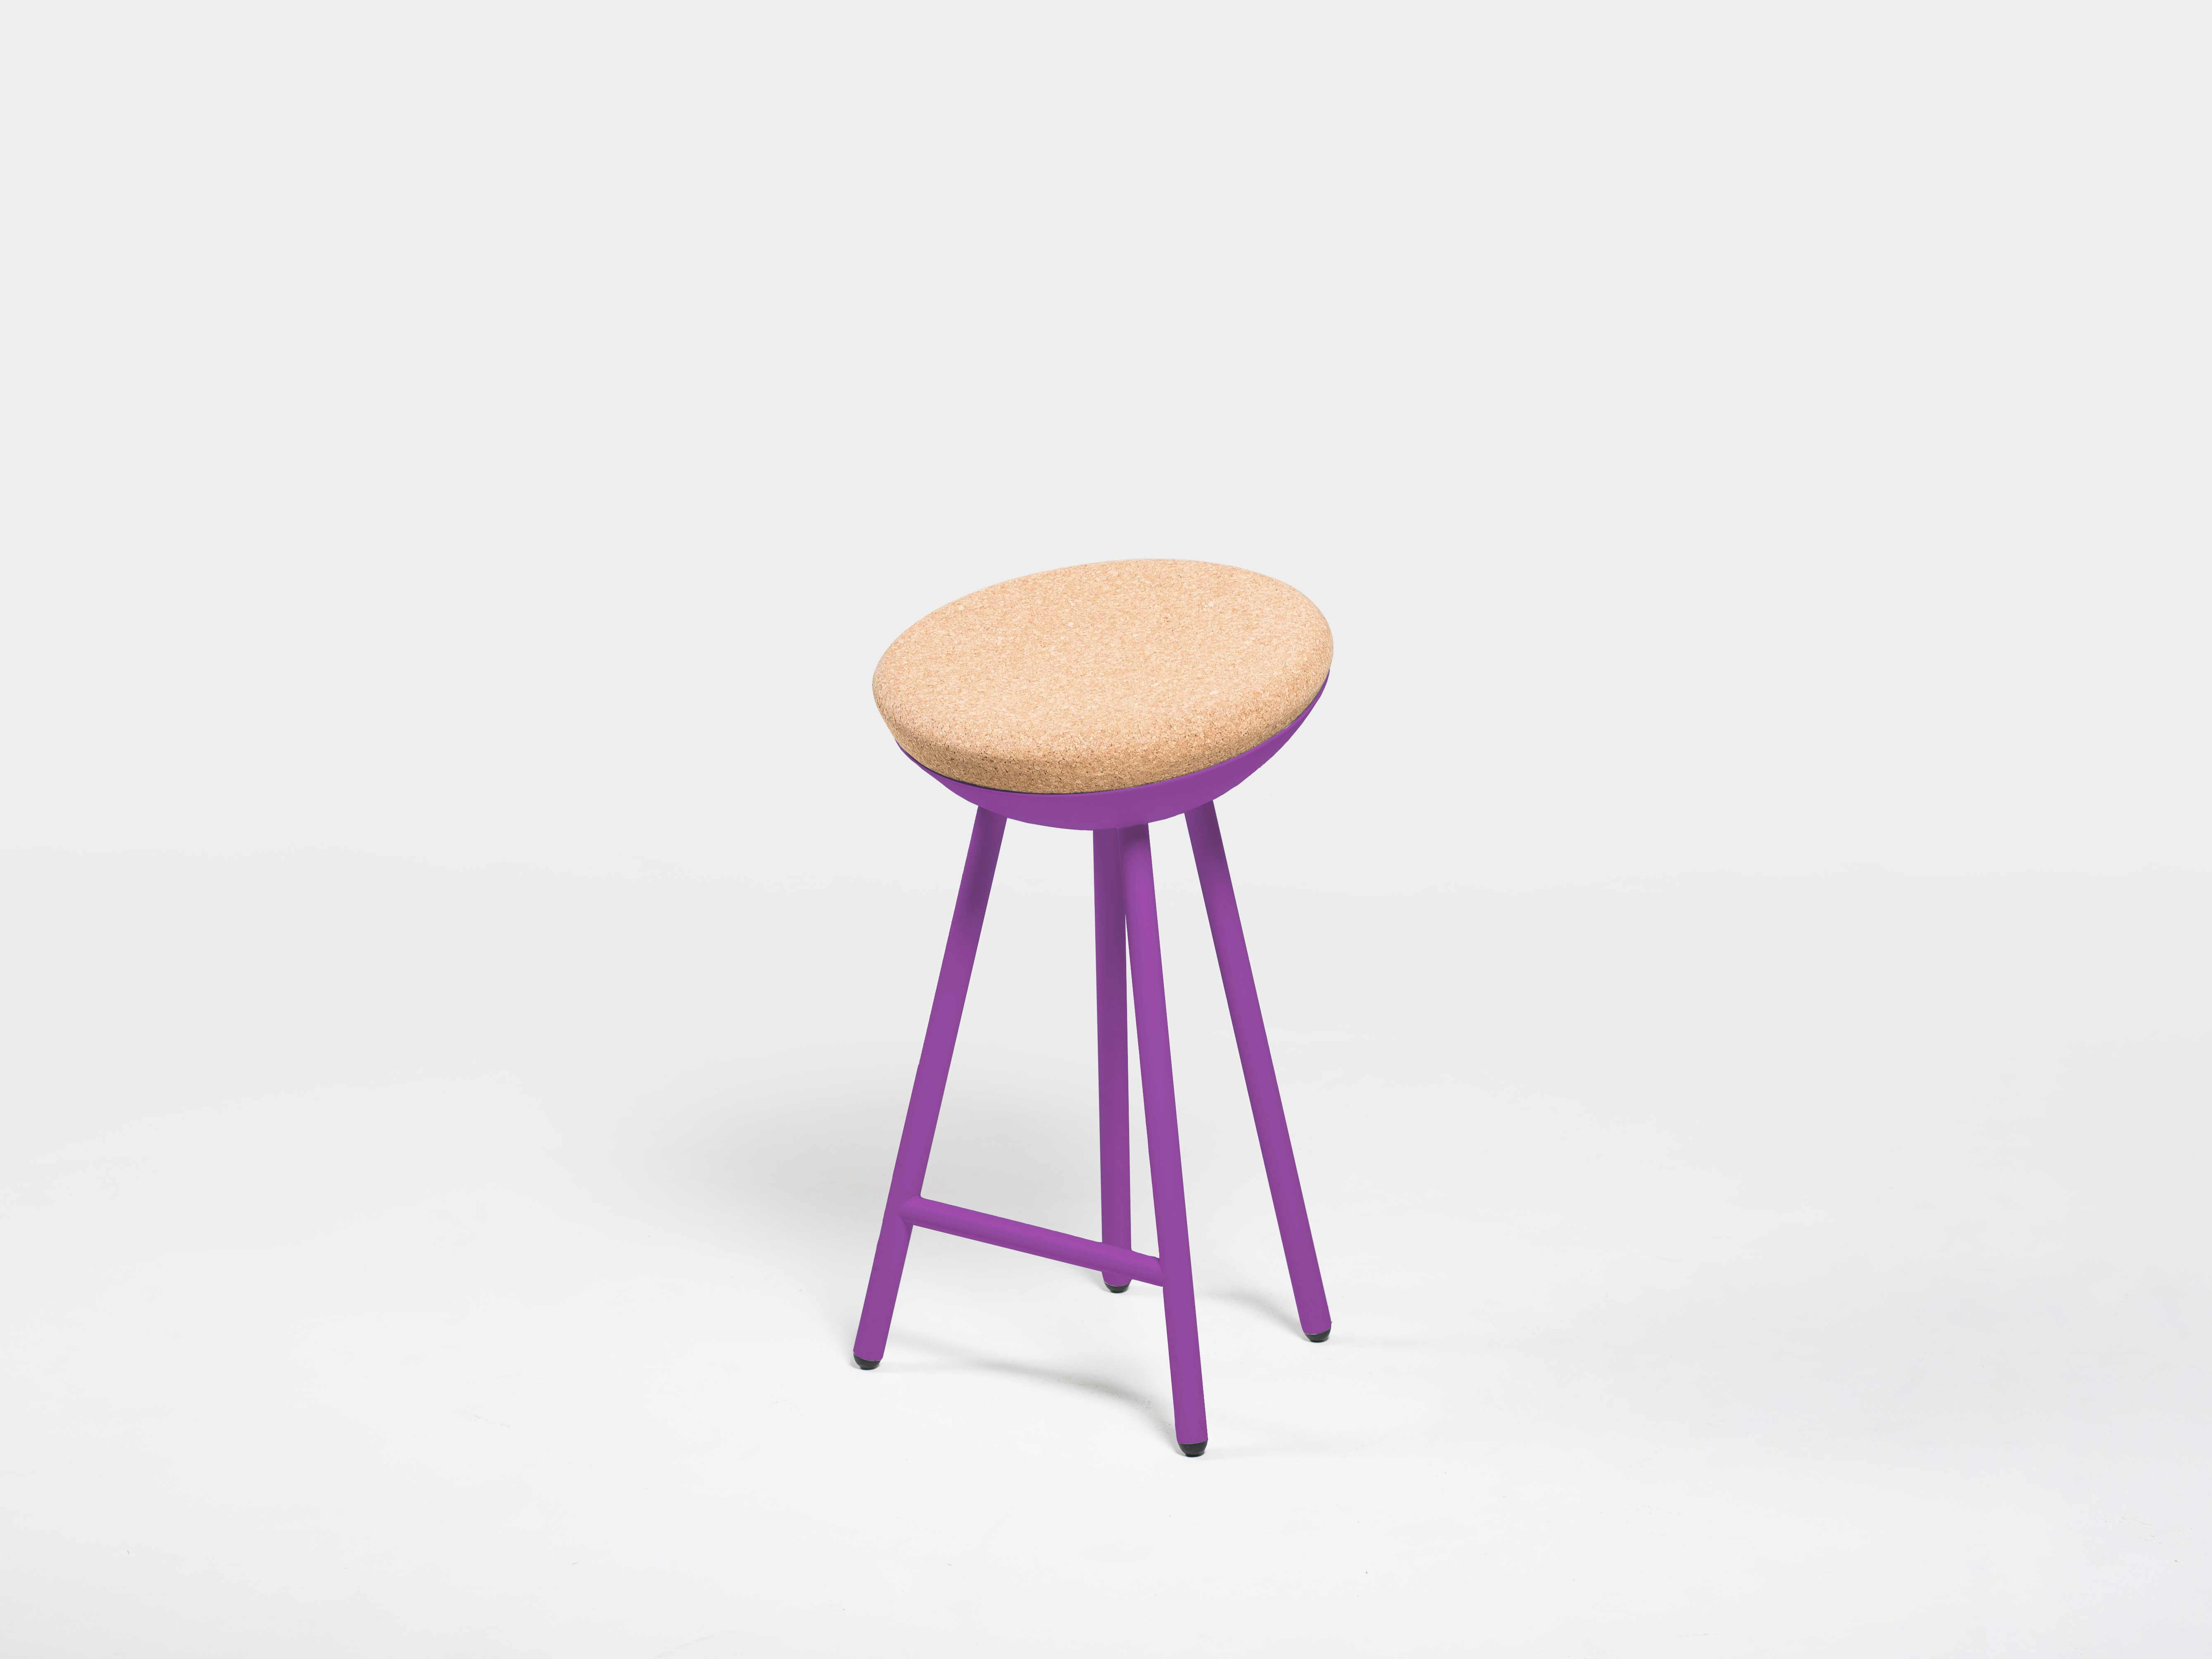 Boet_15_purple_3200x2400